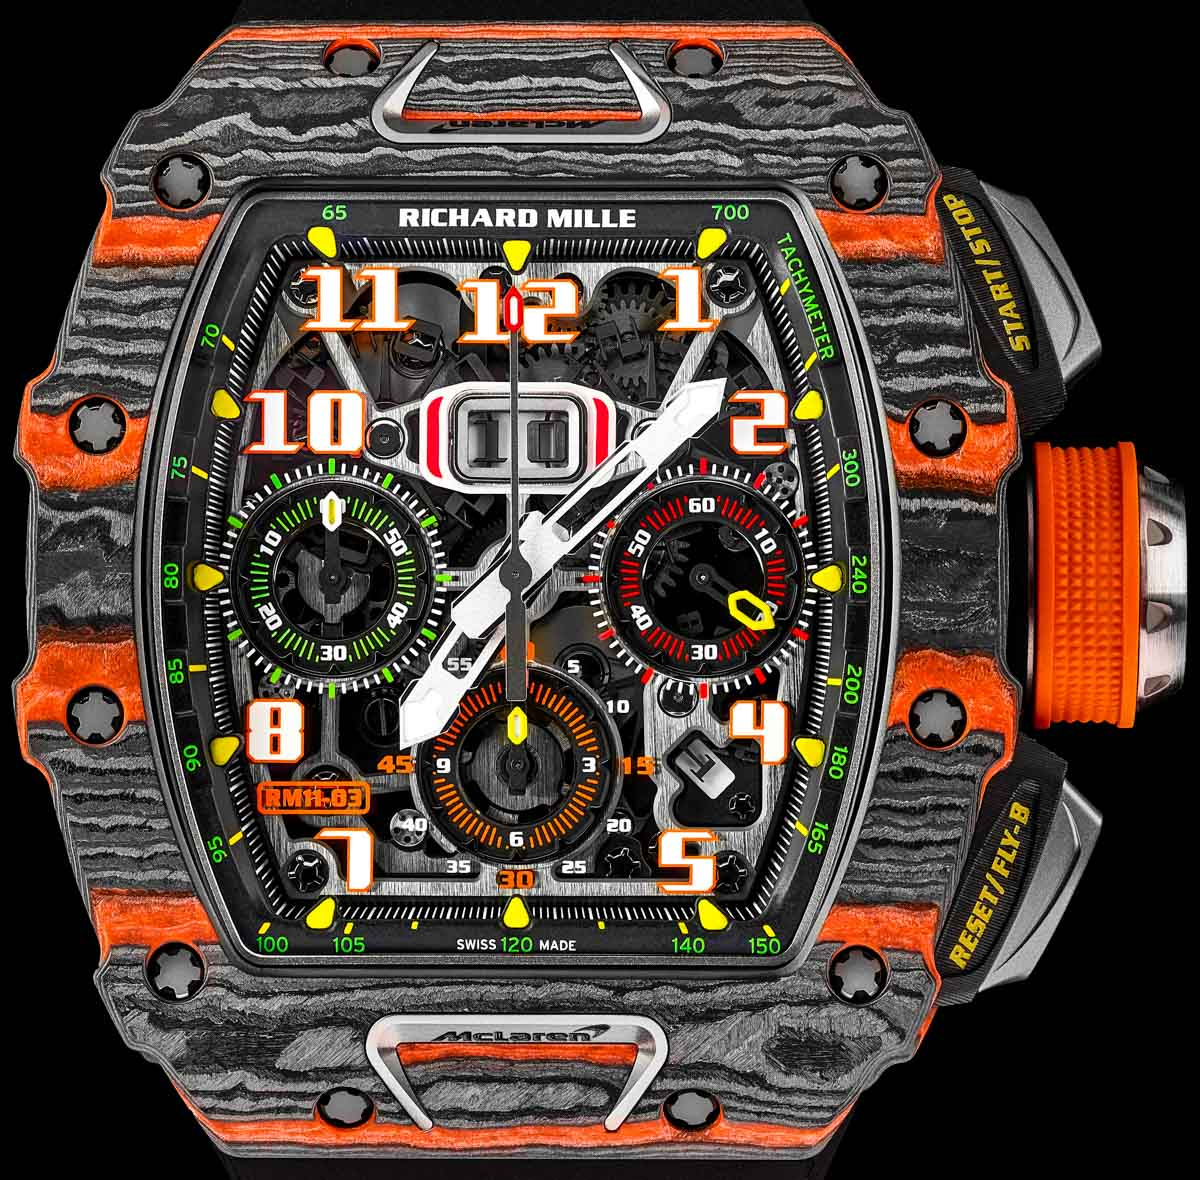 richard-mille-rm-11-03-rm1103-mclaren-automatic-flyback-chronograph-quartztpt-carbontpt-kronograf-karora-svajciora-orasblog-3.jpg